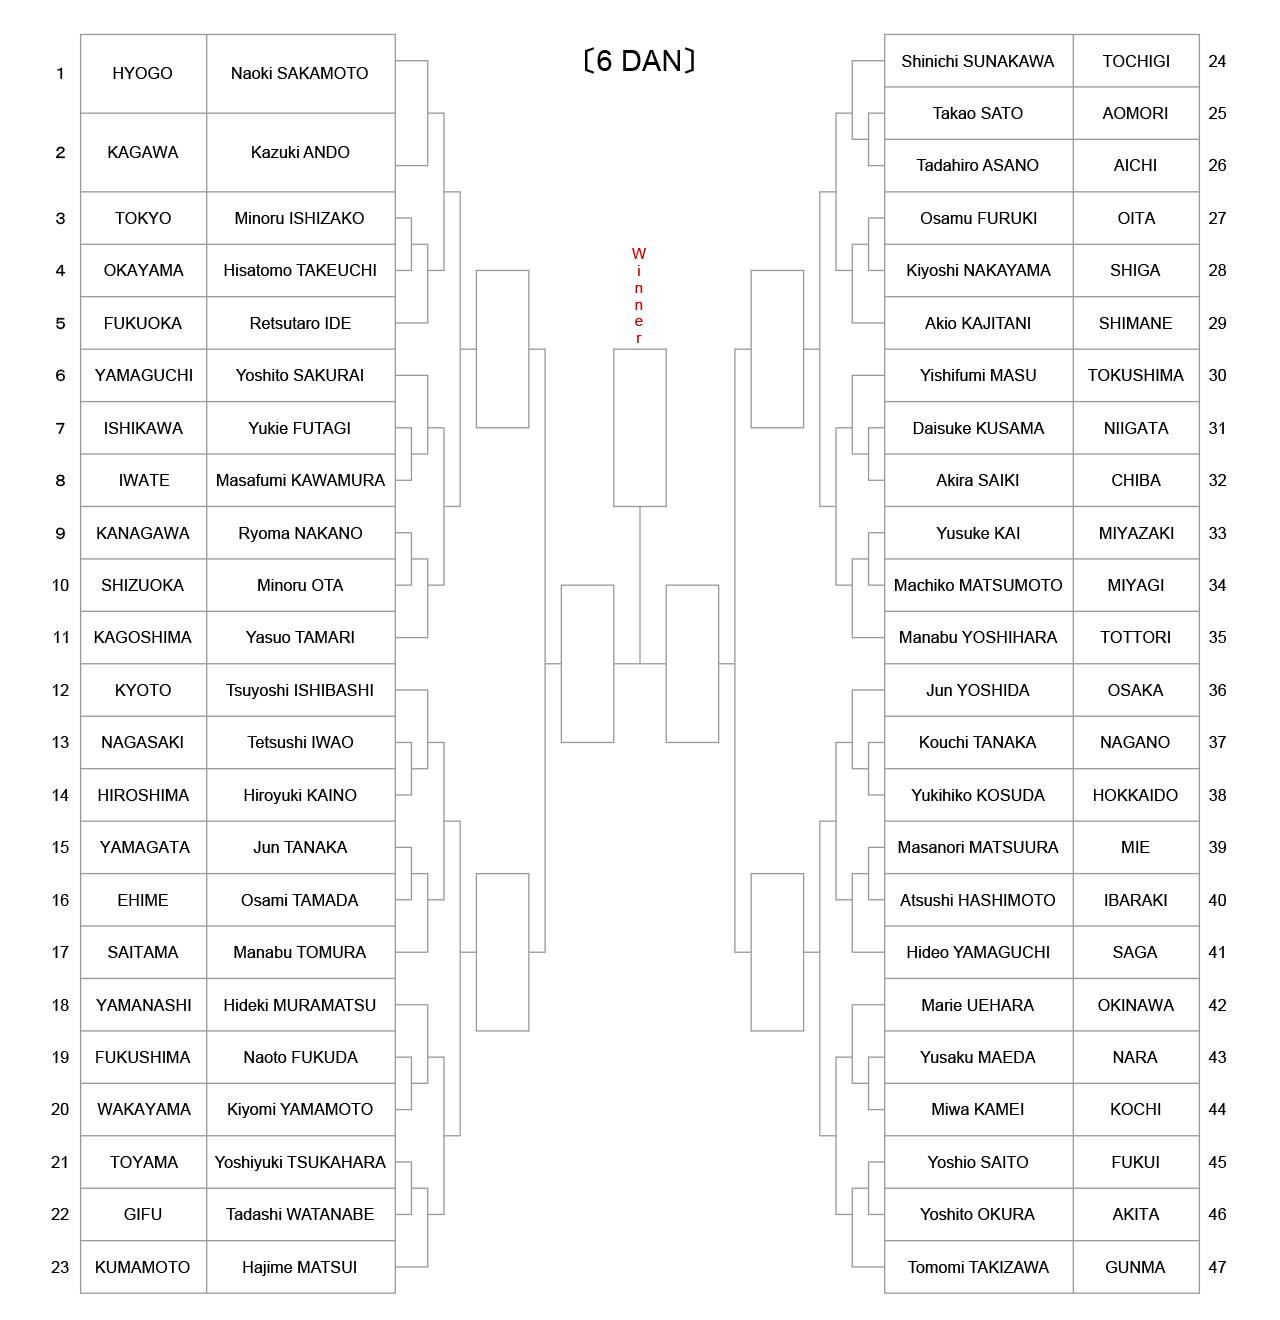 iaido_tournament-tree-6dan_2021